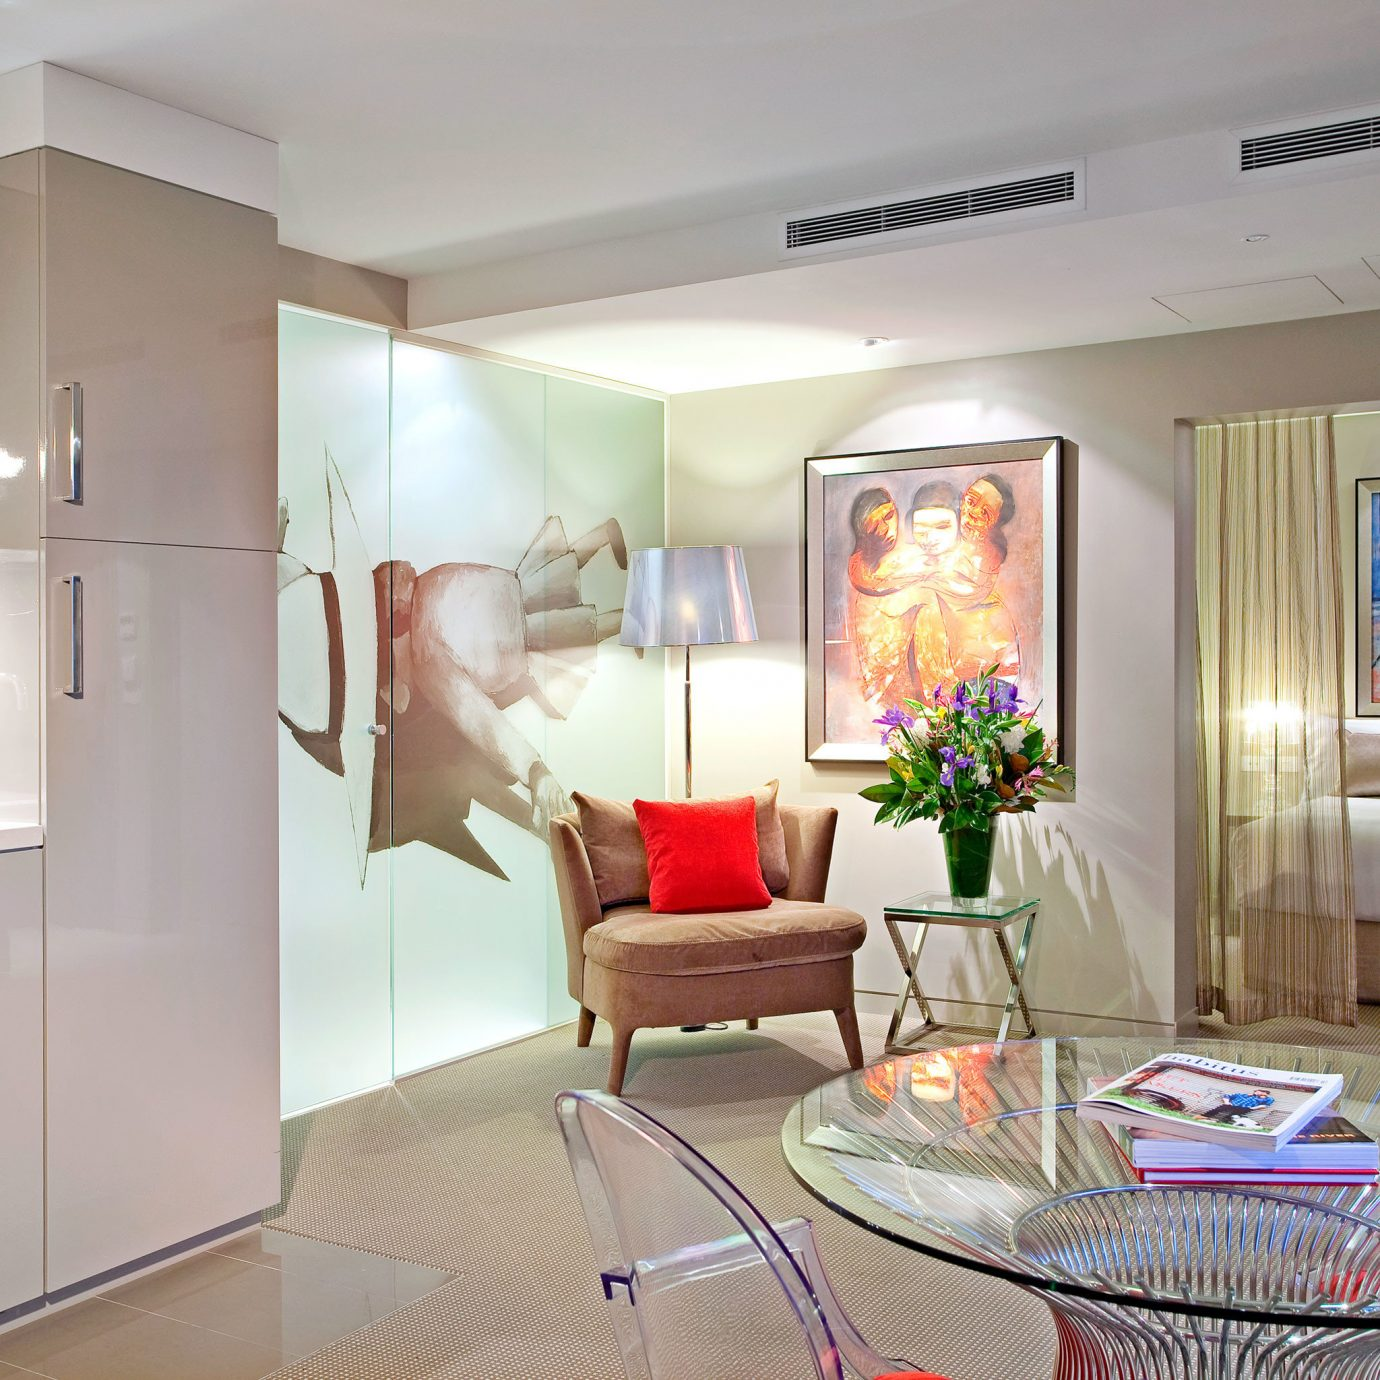 Drink Eat Hip Kitchen Modern property home house living room condominium cottage Suite kitchen appliance